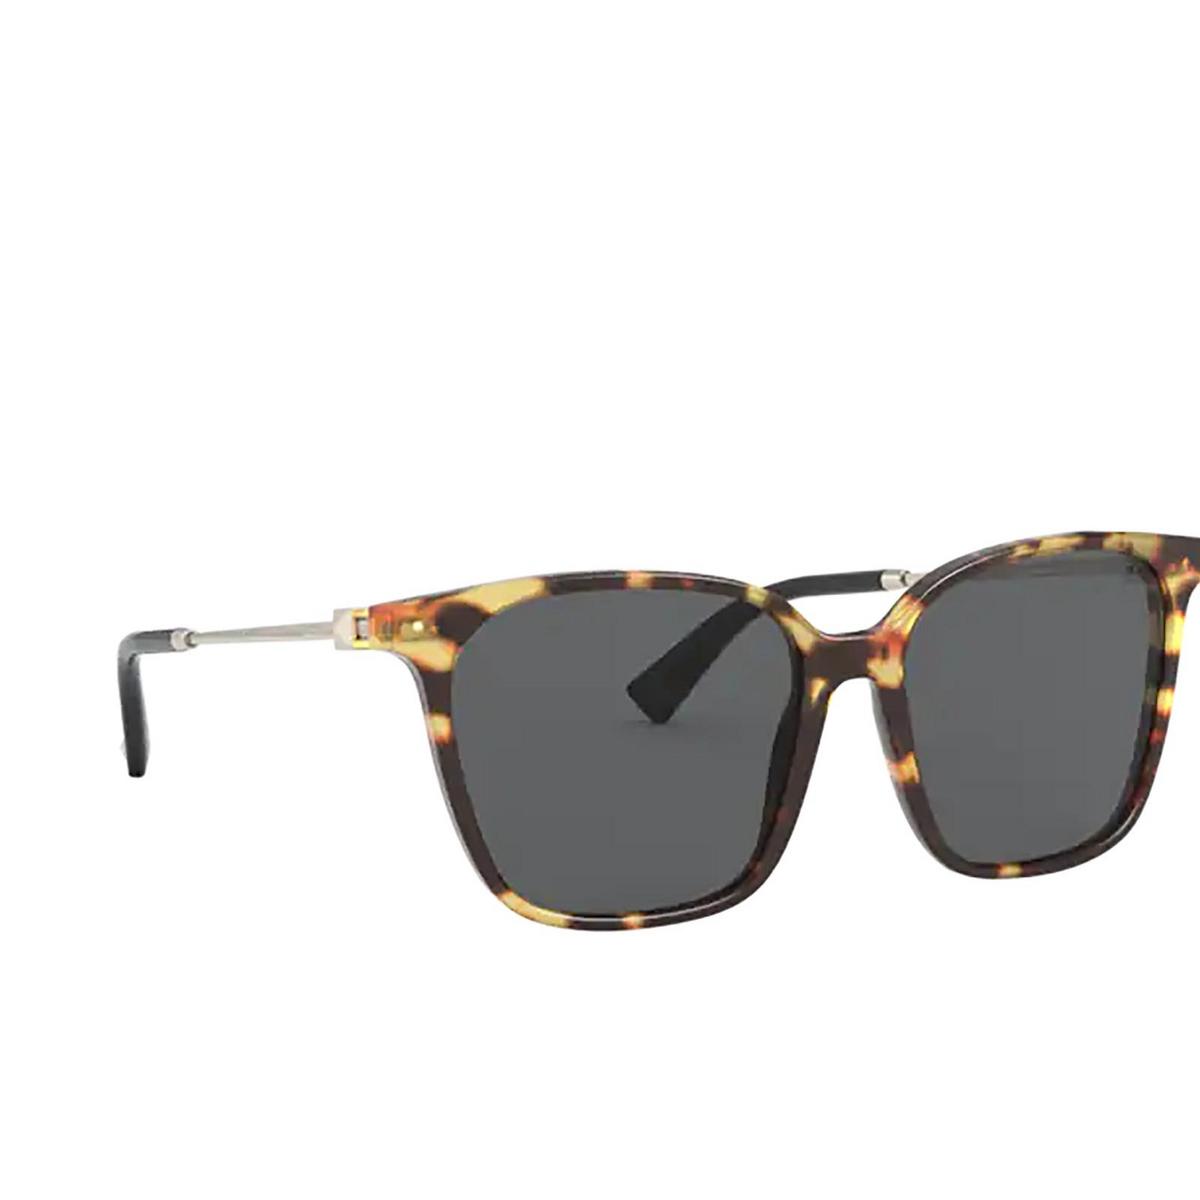 Valentino® Square Sunglasses: VA4078 color Havana 503687 - three-quarters view.